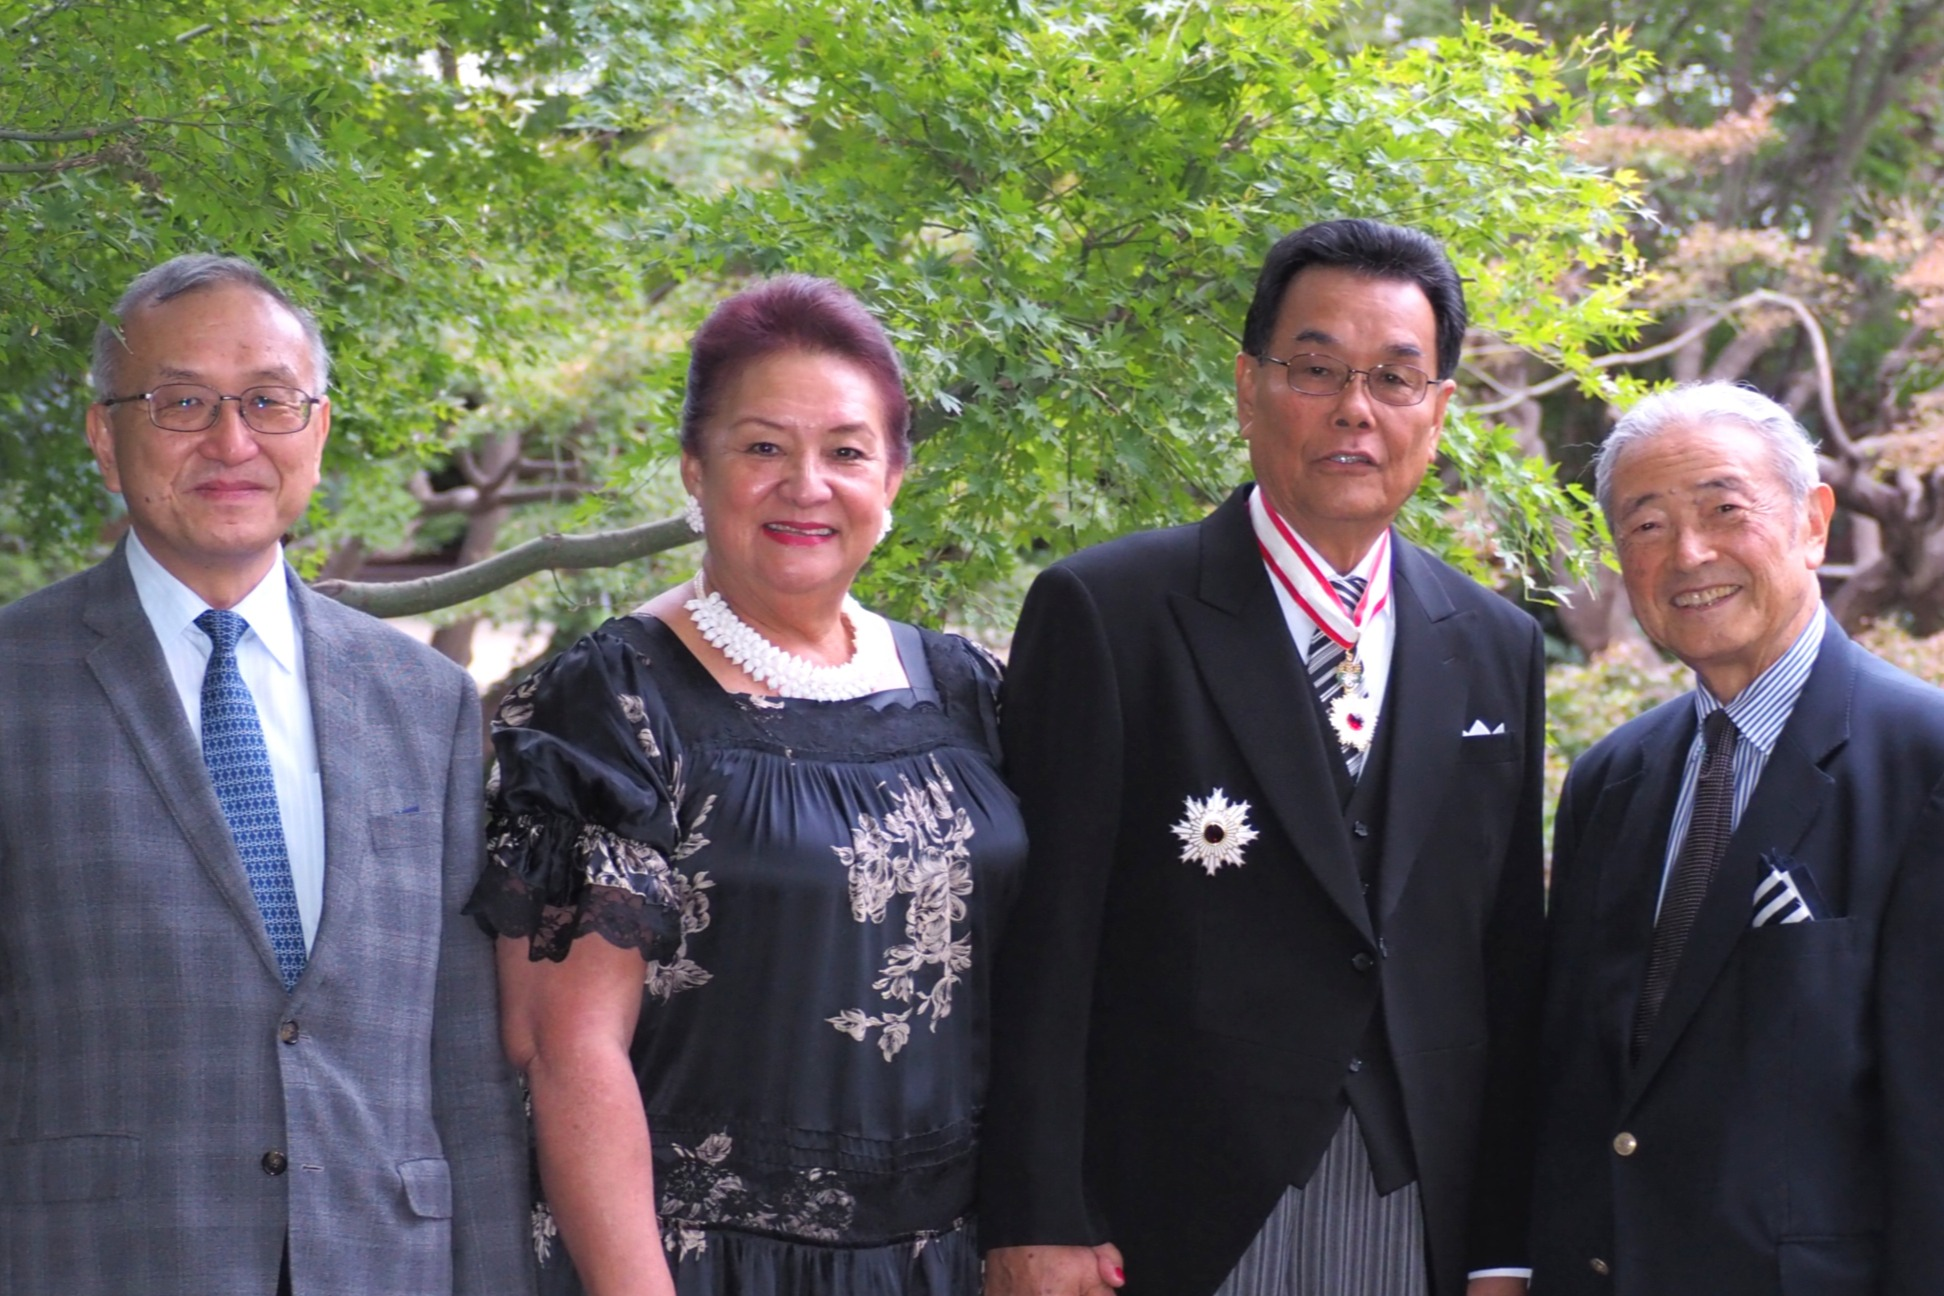 APIC Congratulates FSM Ambassador Kasio Mida on Receiving Imperial Honors